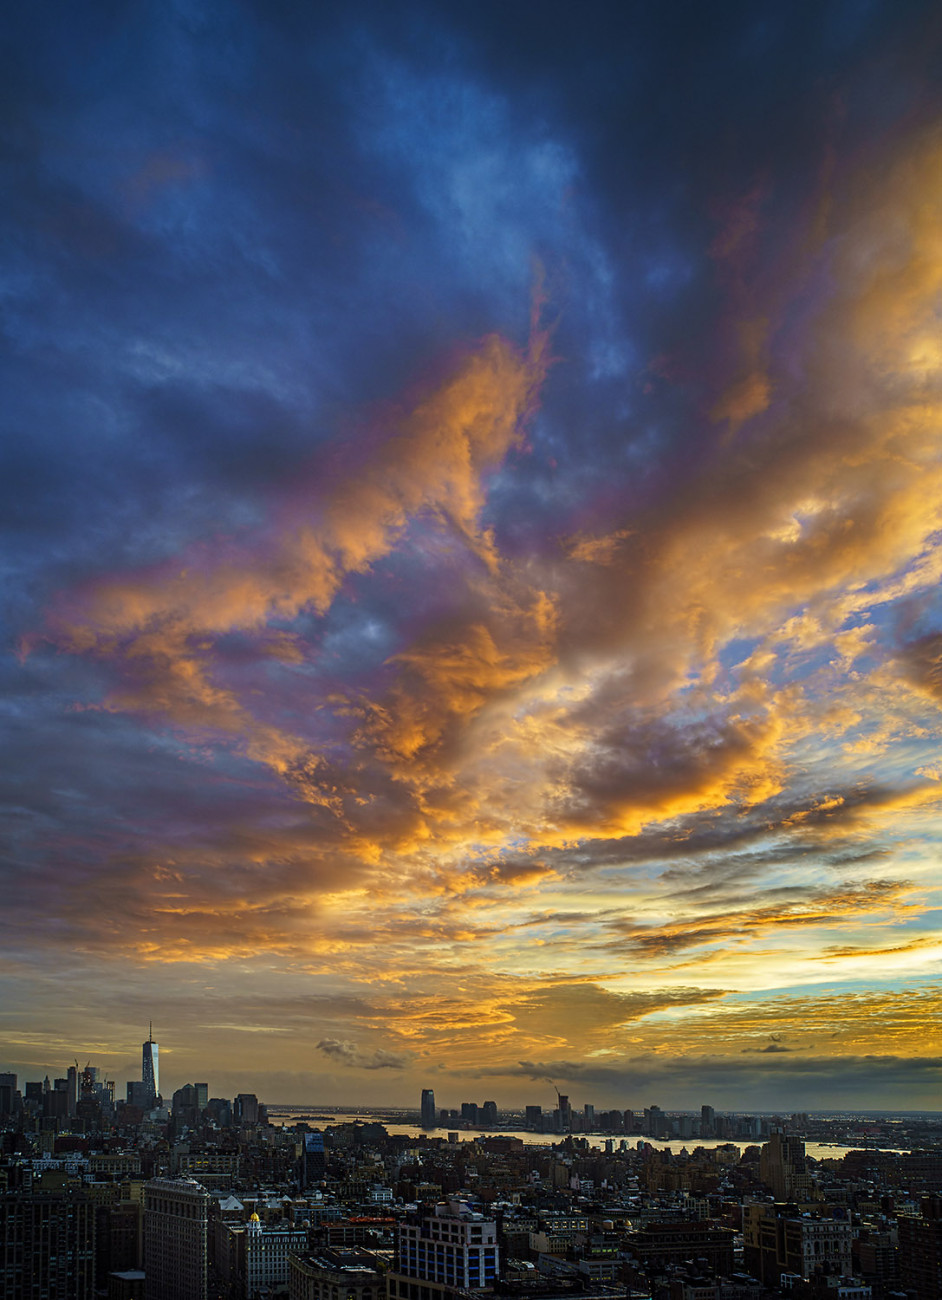 Turner sunset over lower Manhattan (study 2), NY, 2015